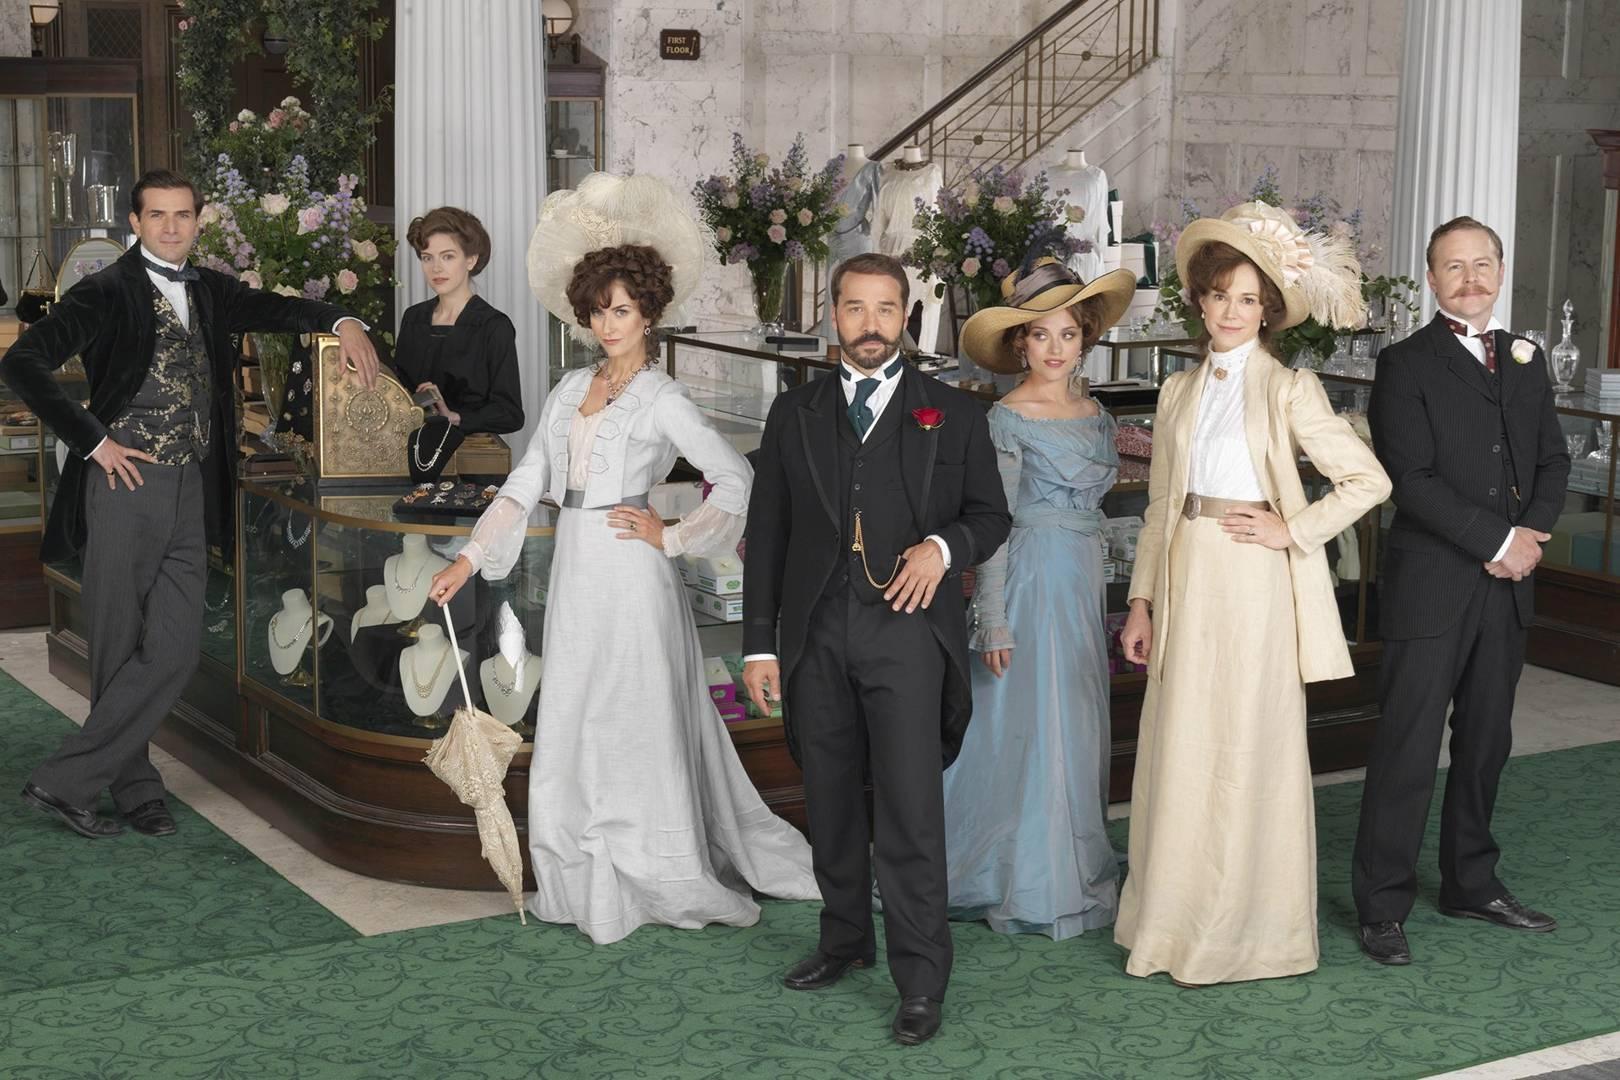 The Best Period Dramas: Victoria Season 2, Poldark, The Crown & More